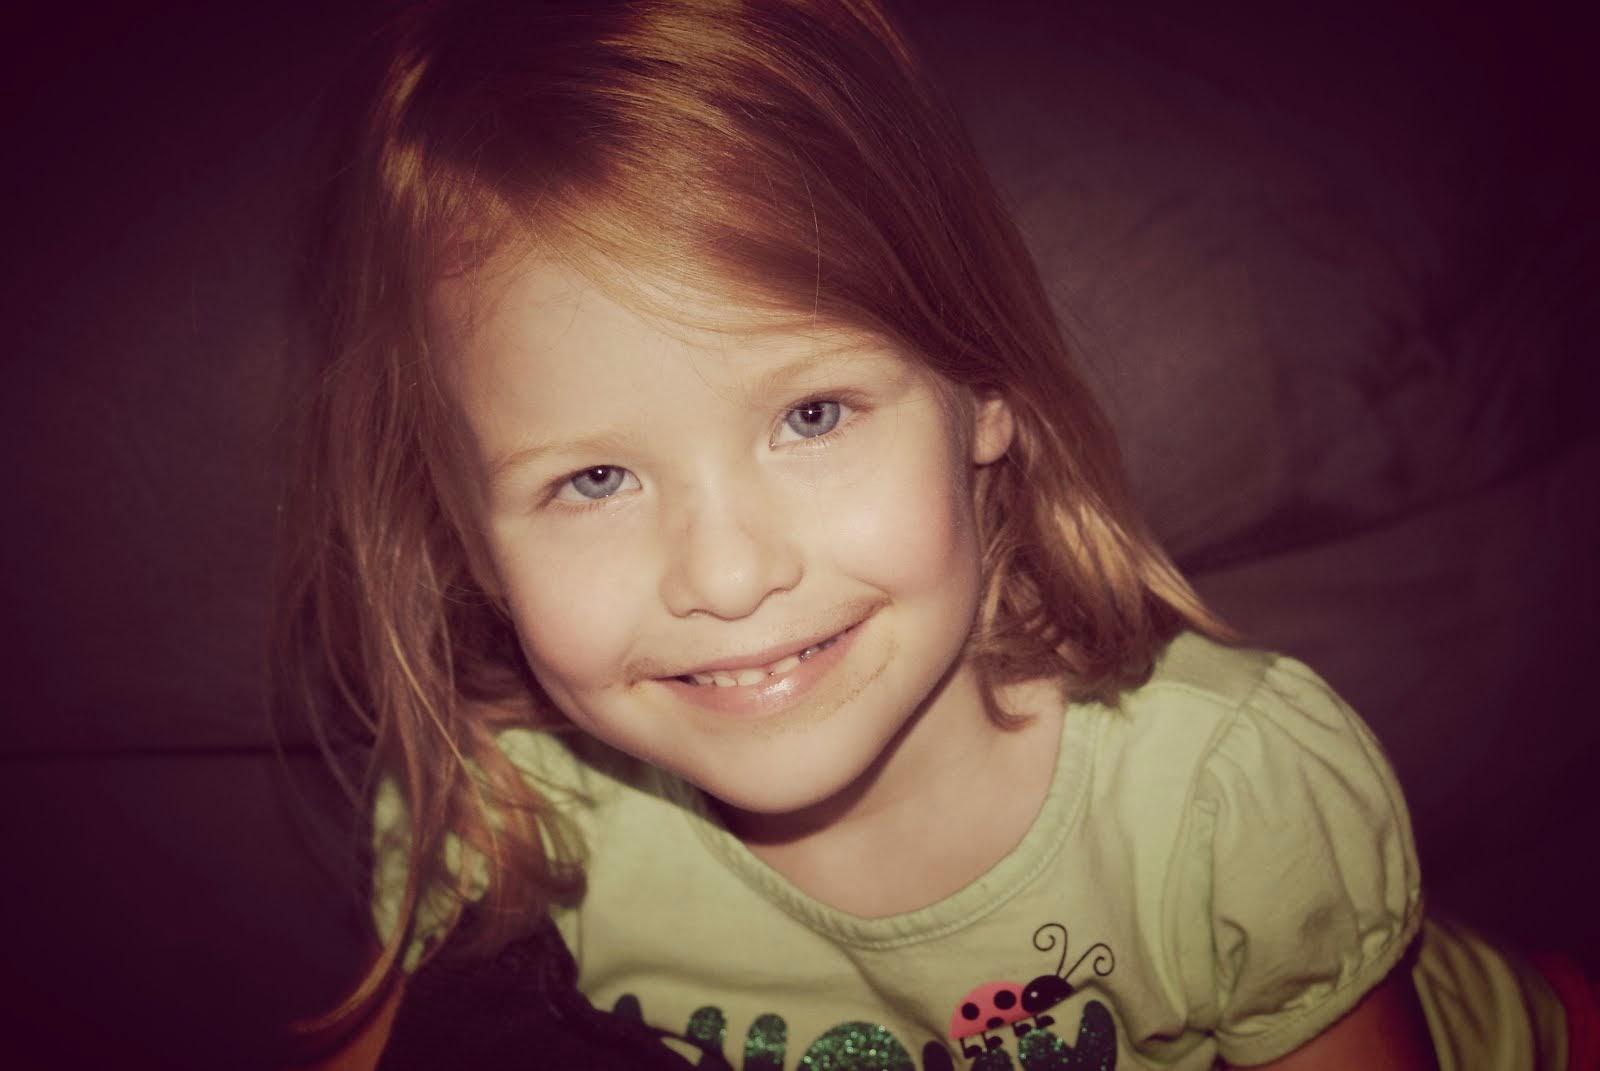 Our Precious Girl